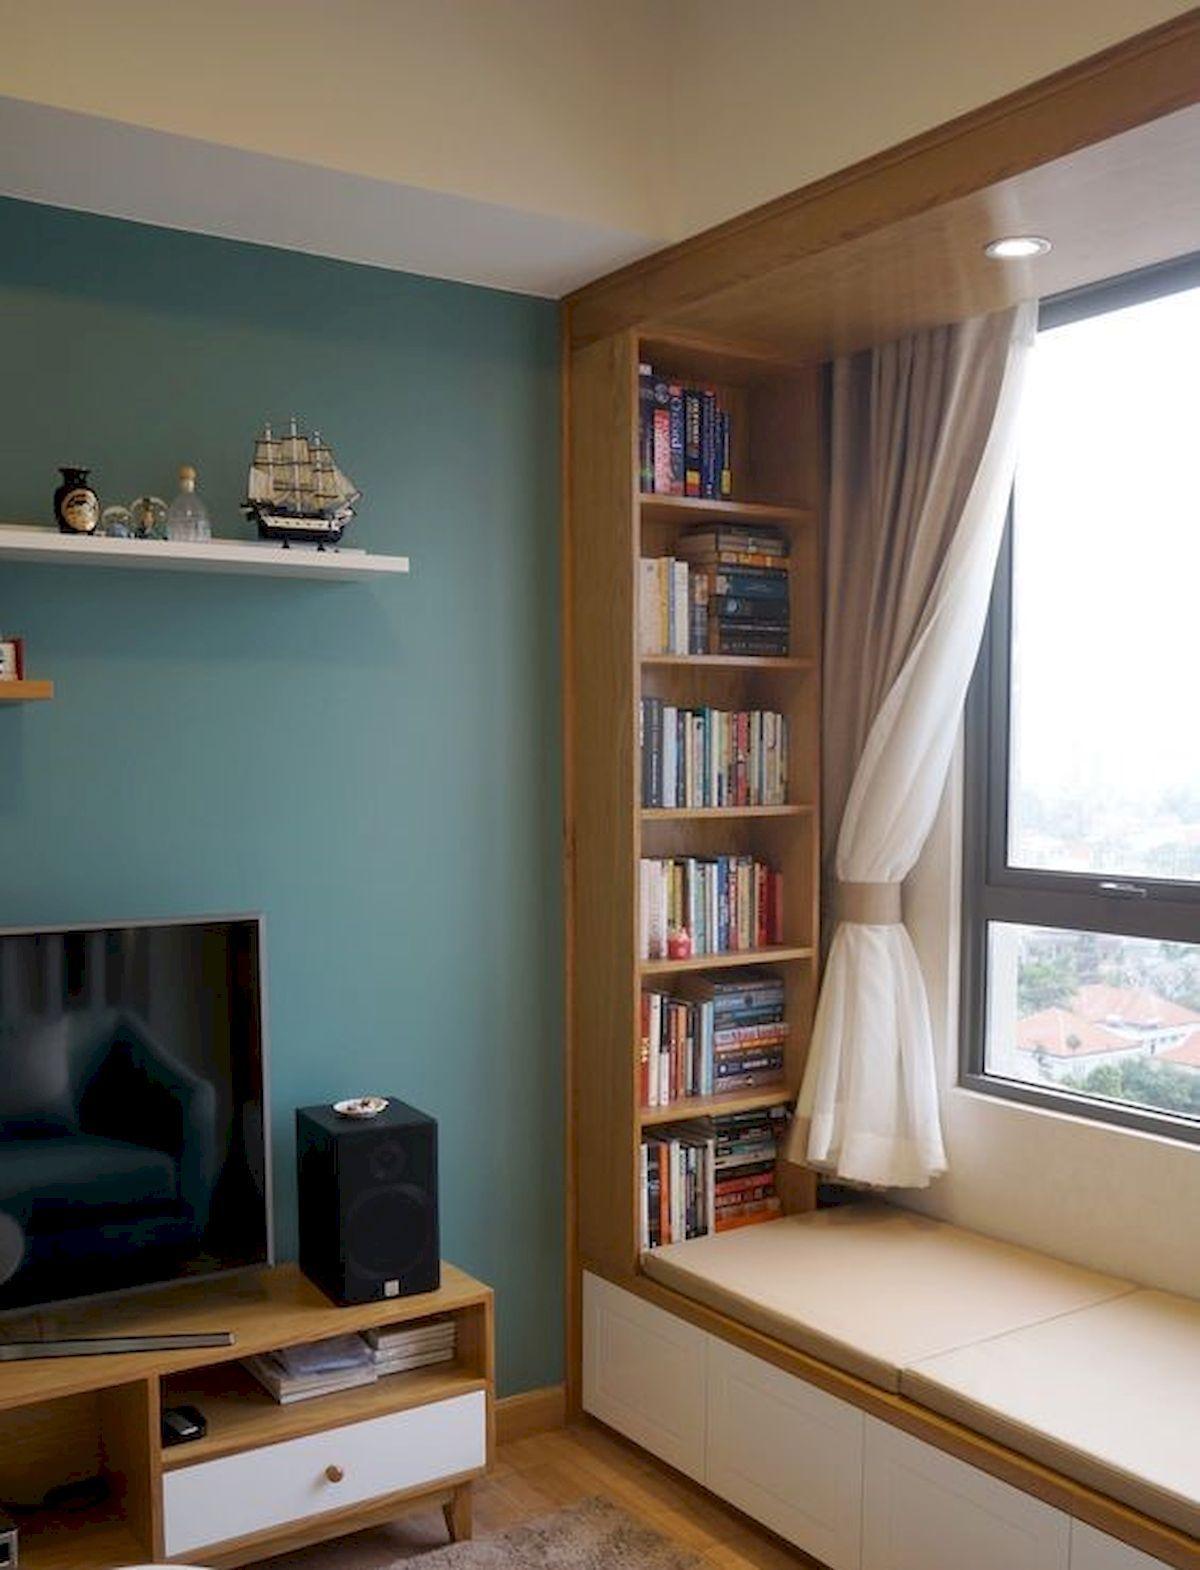 Pin by Neffati on ideas  Window seat design, Home decor bedroom